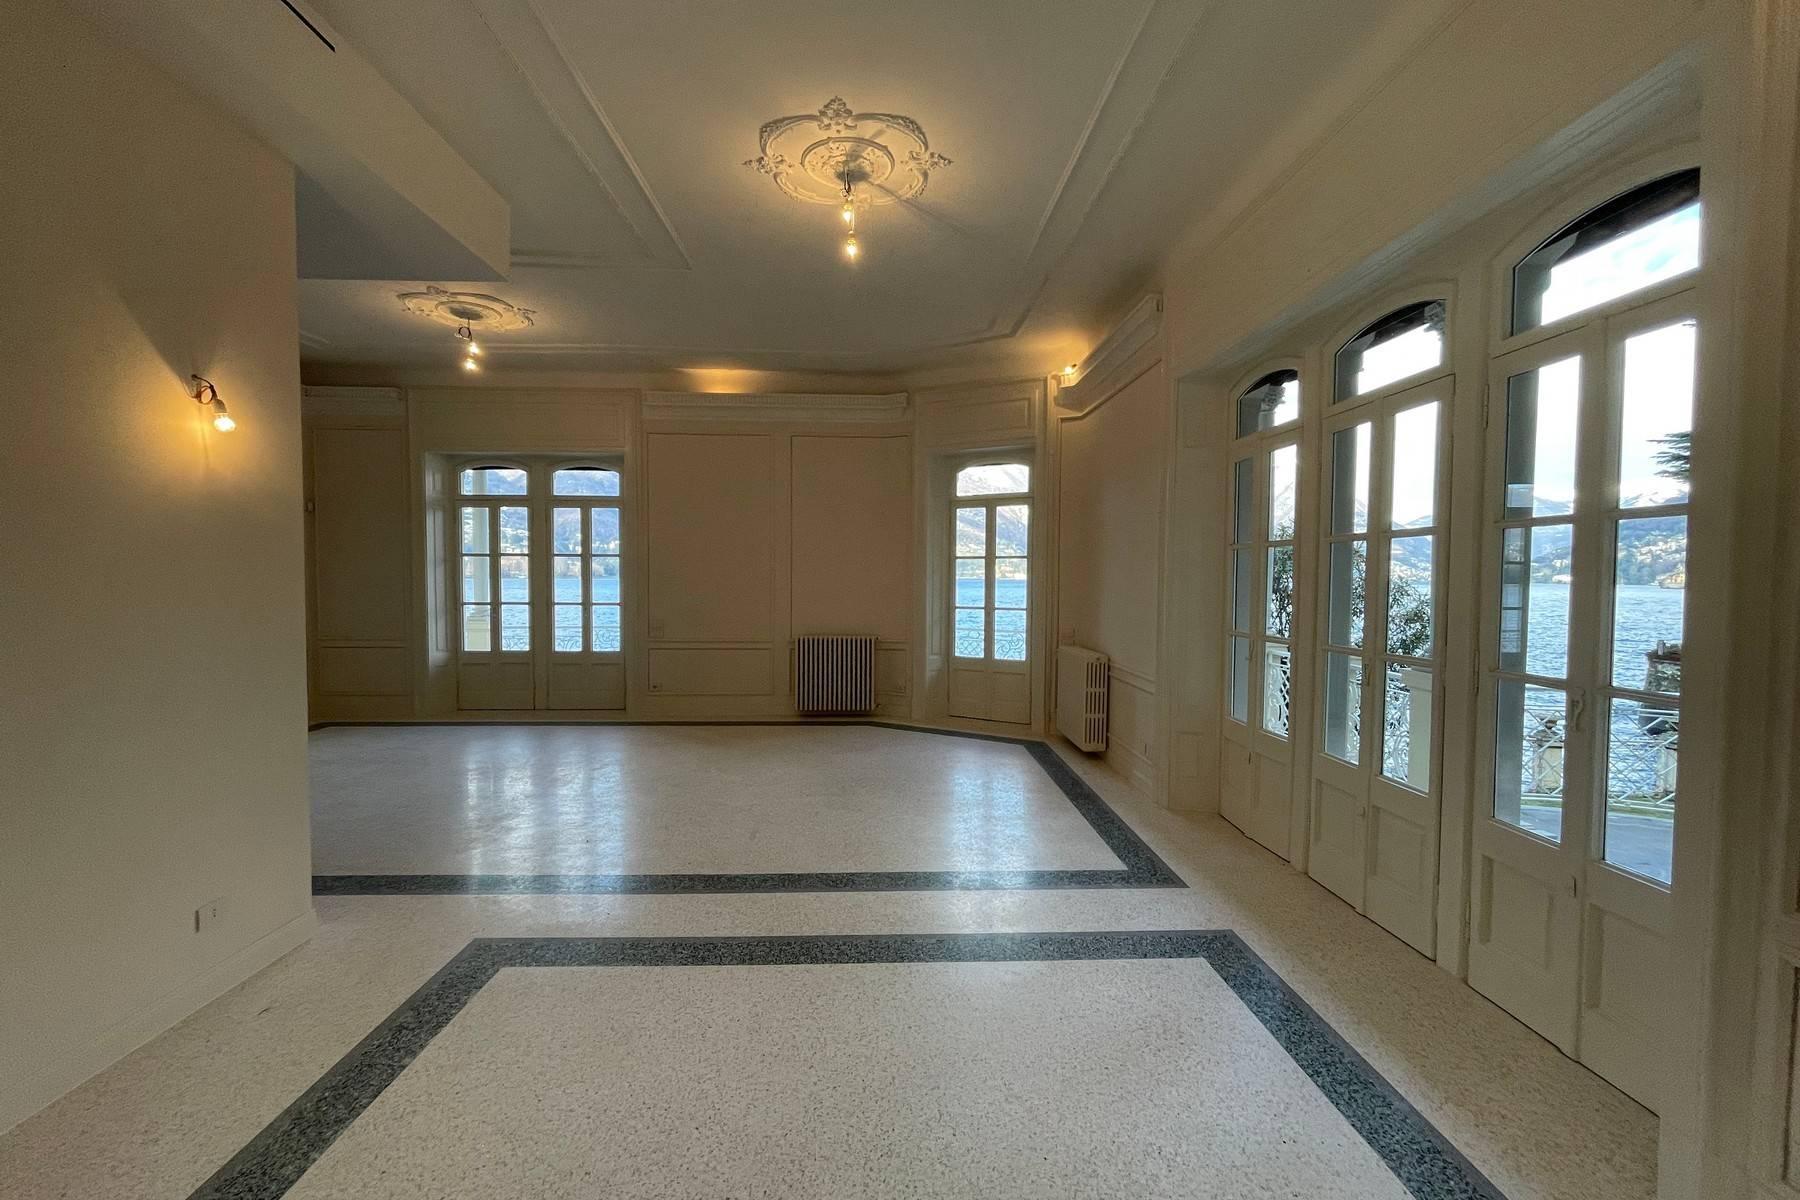 Maestosa Villa in stile Liberty - 5